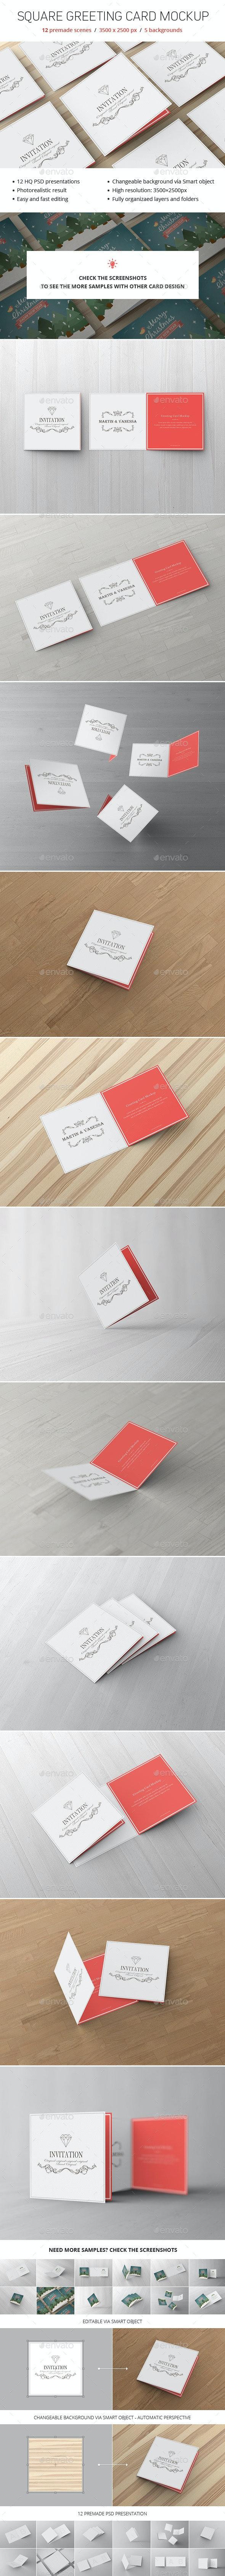 Square Greeting Card Mockup - Brochures Print